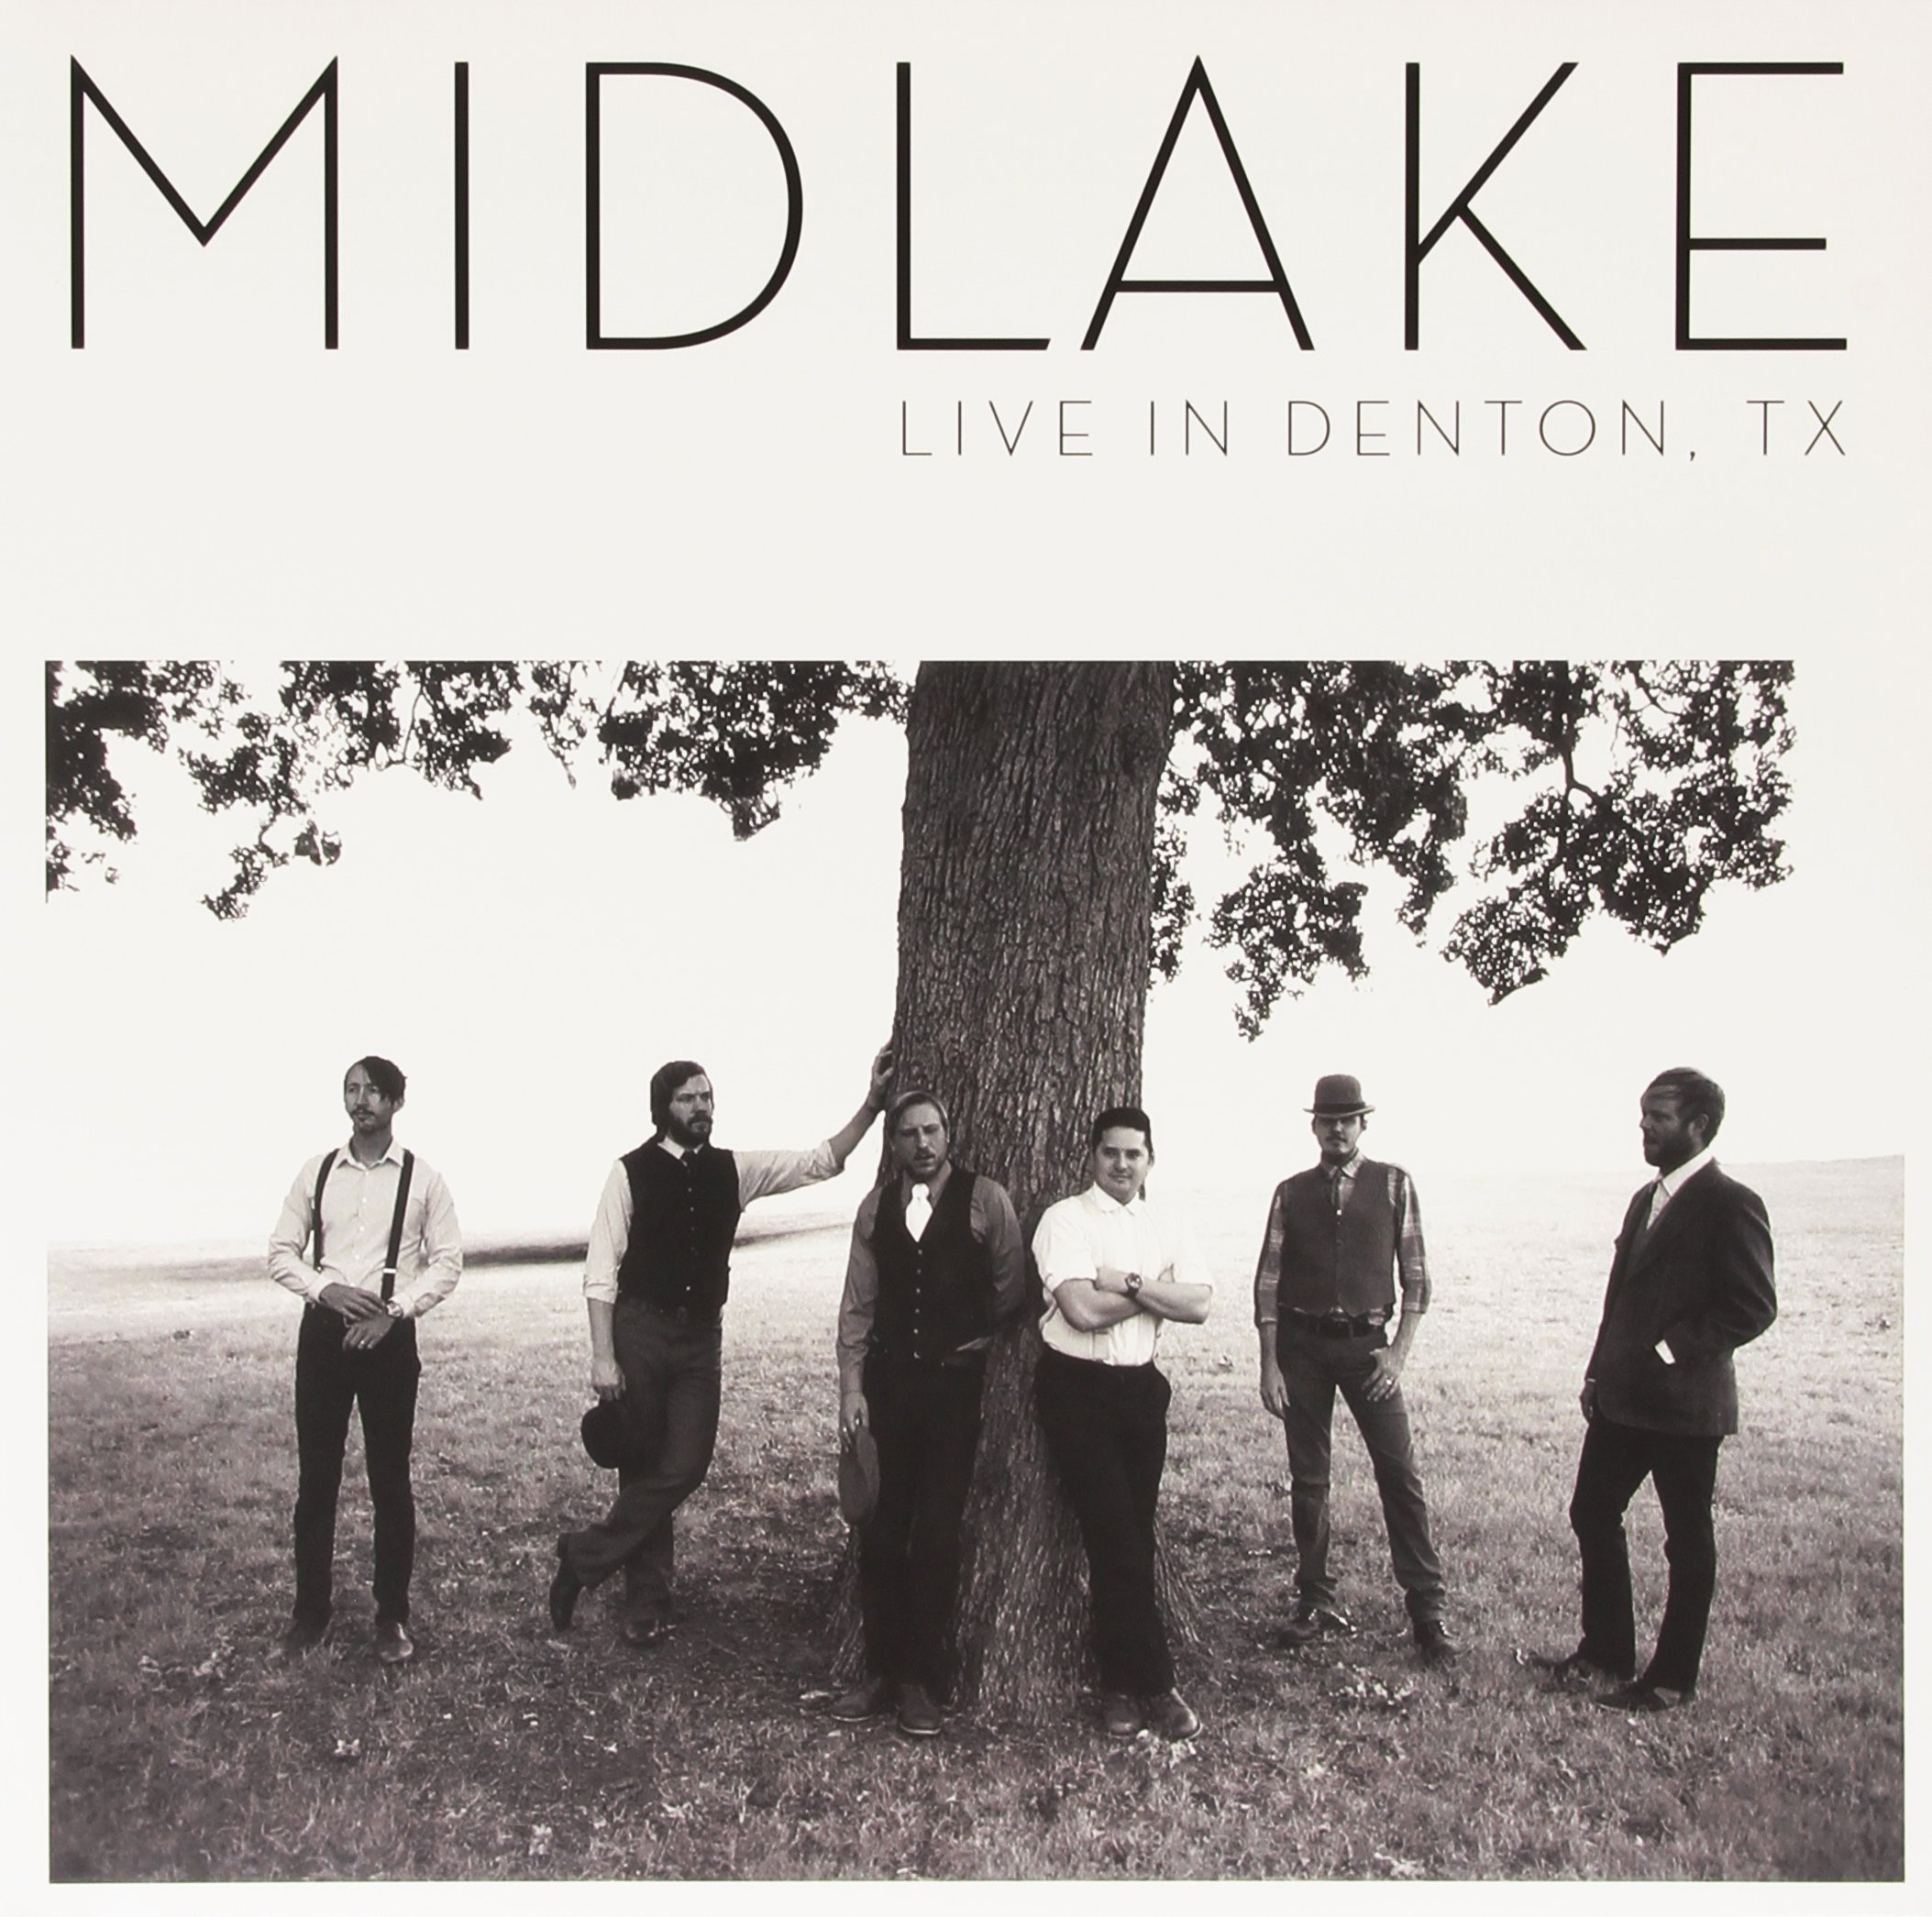 Midlake - Live in Denton Tx